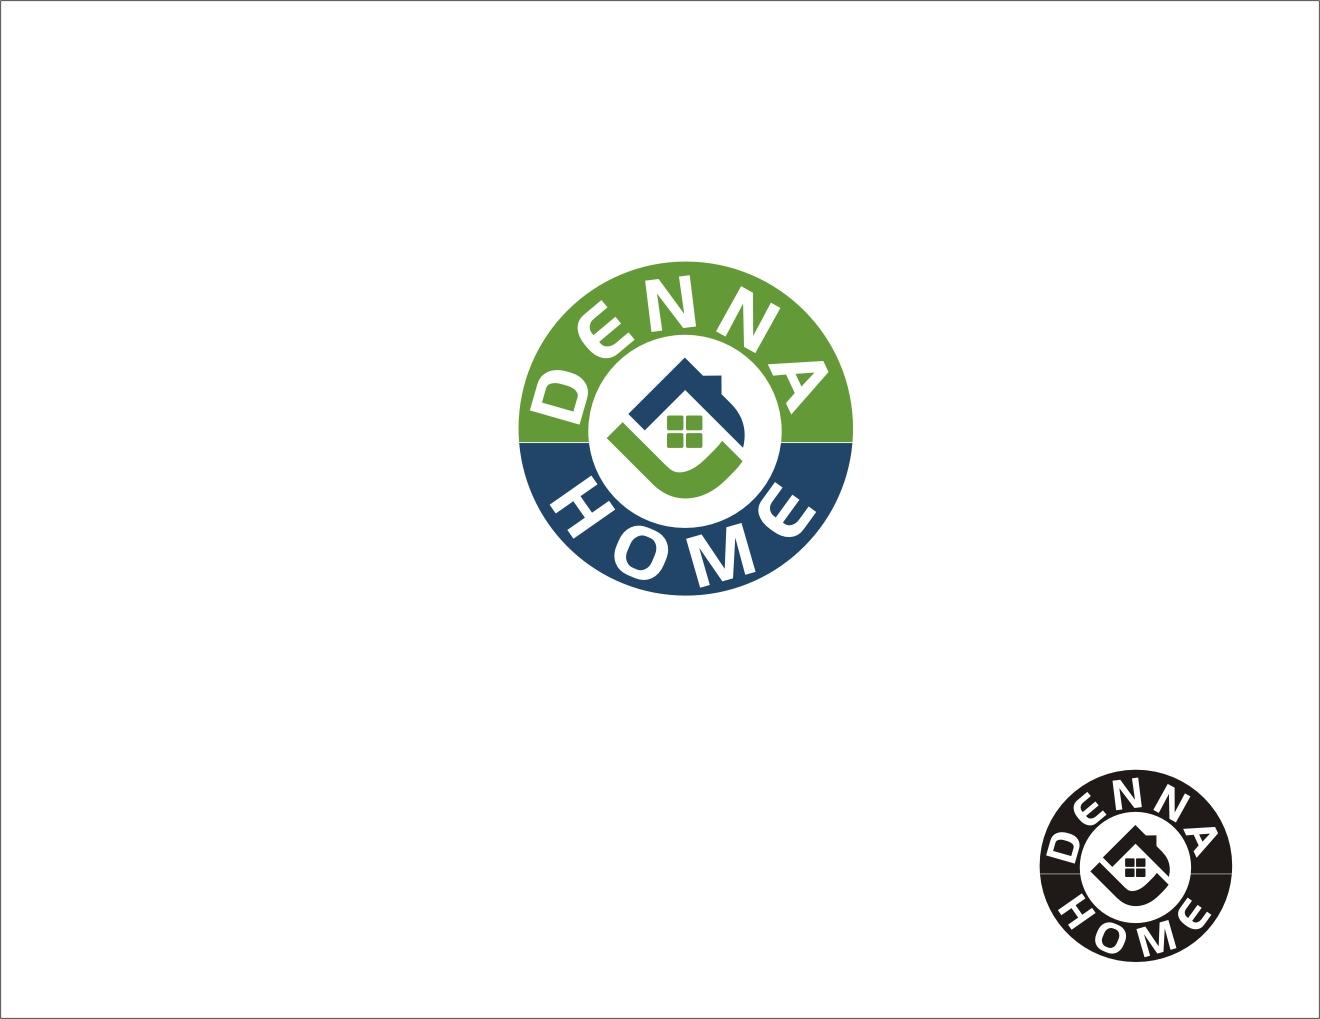 Logo Design by Private User - Entry No. 272 in the Logo Design Contest Denna Group Logo Design.